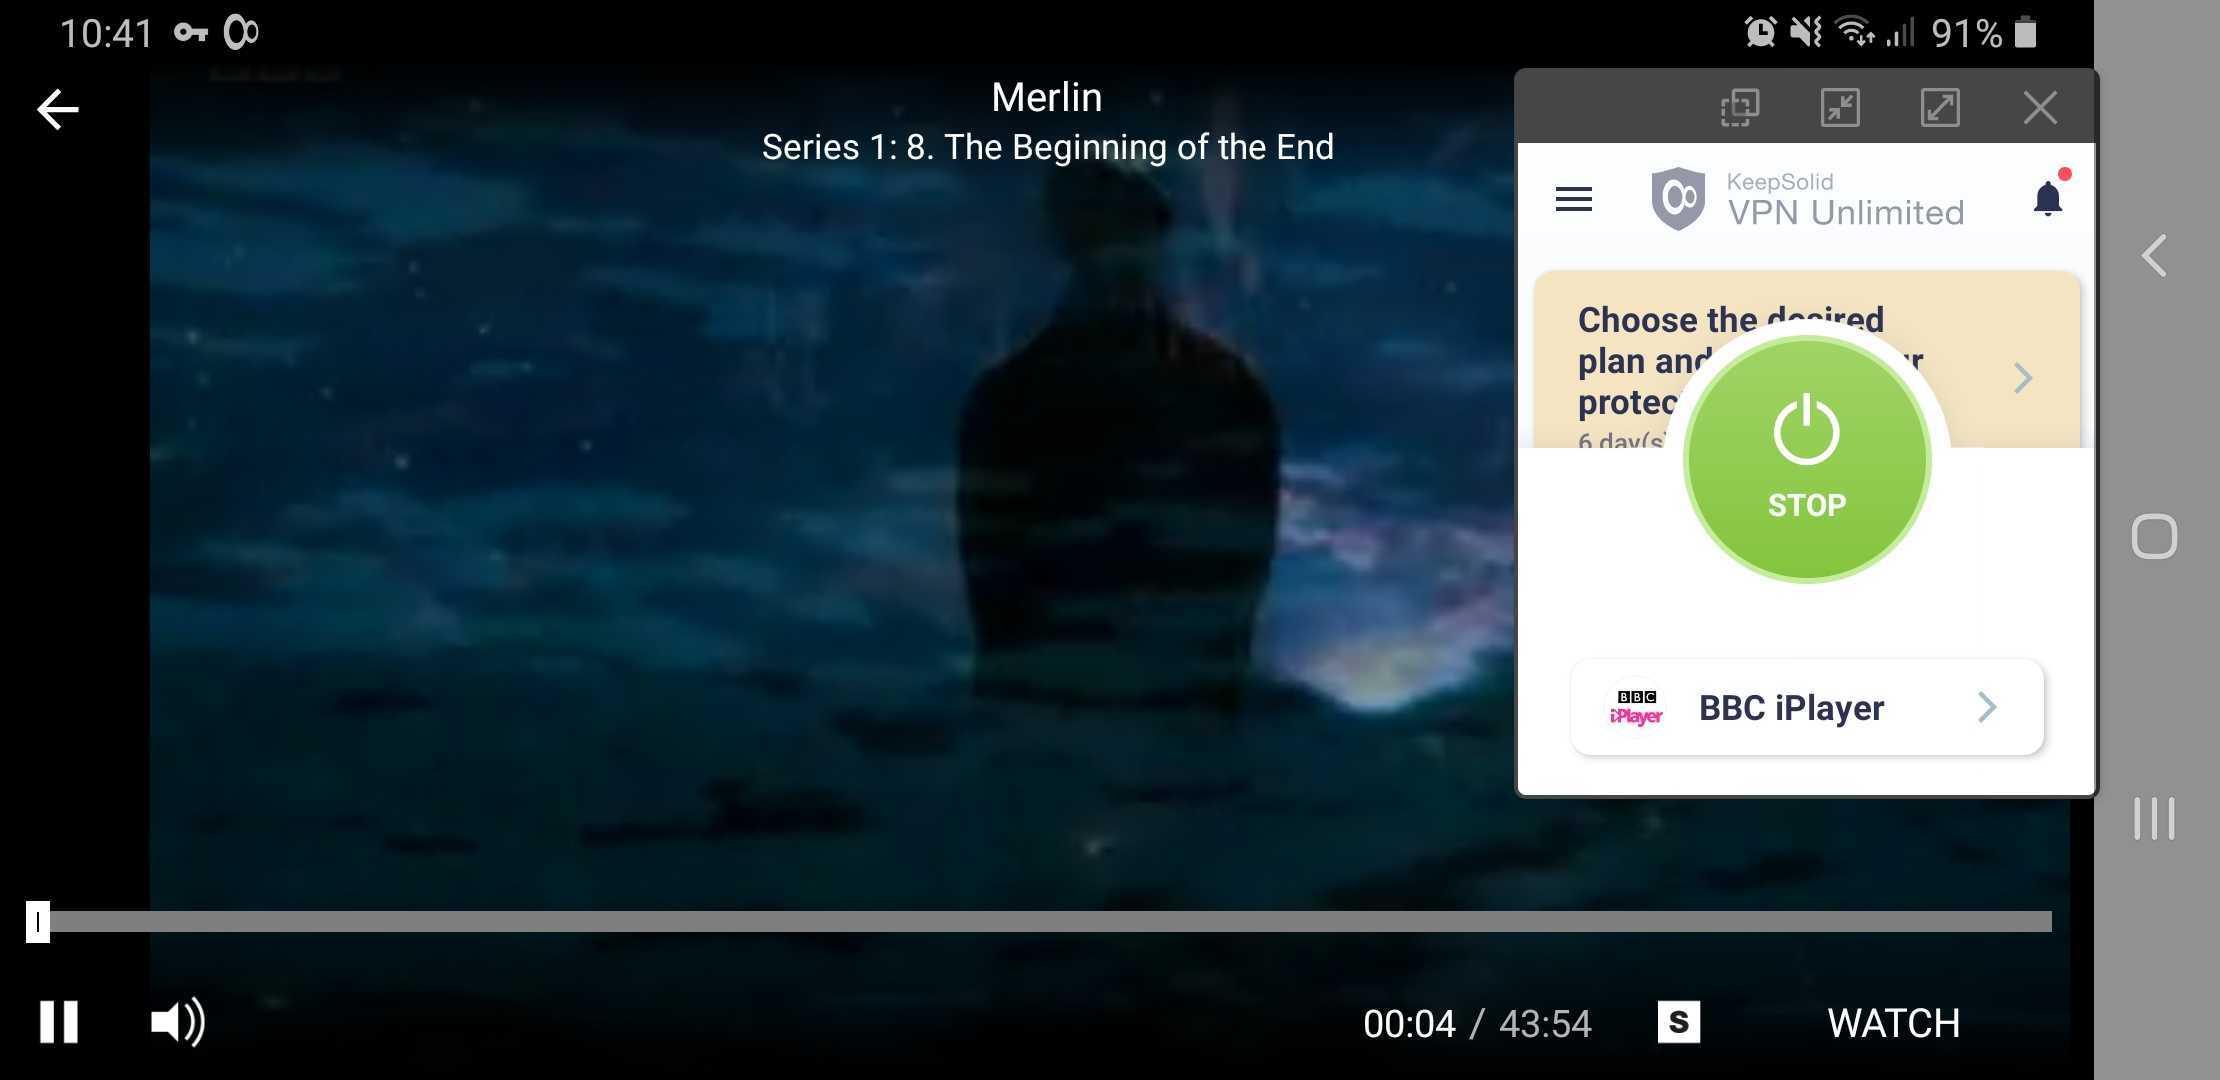 BBC iPlayer Unlimited